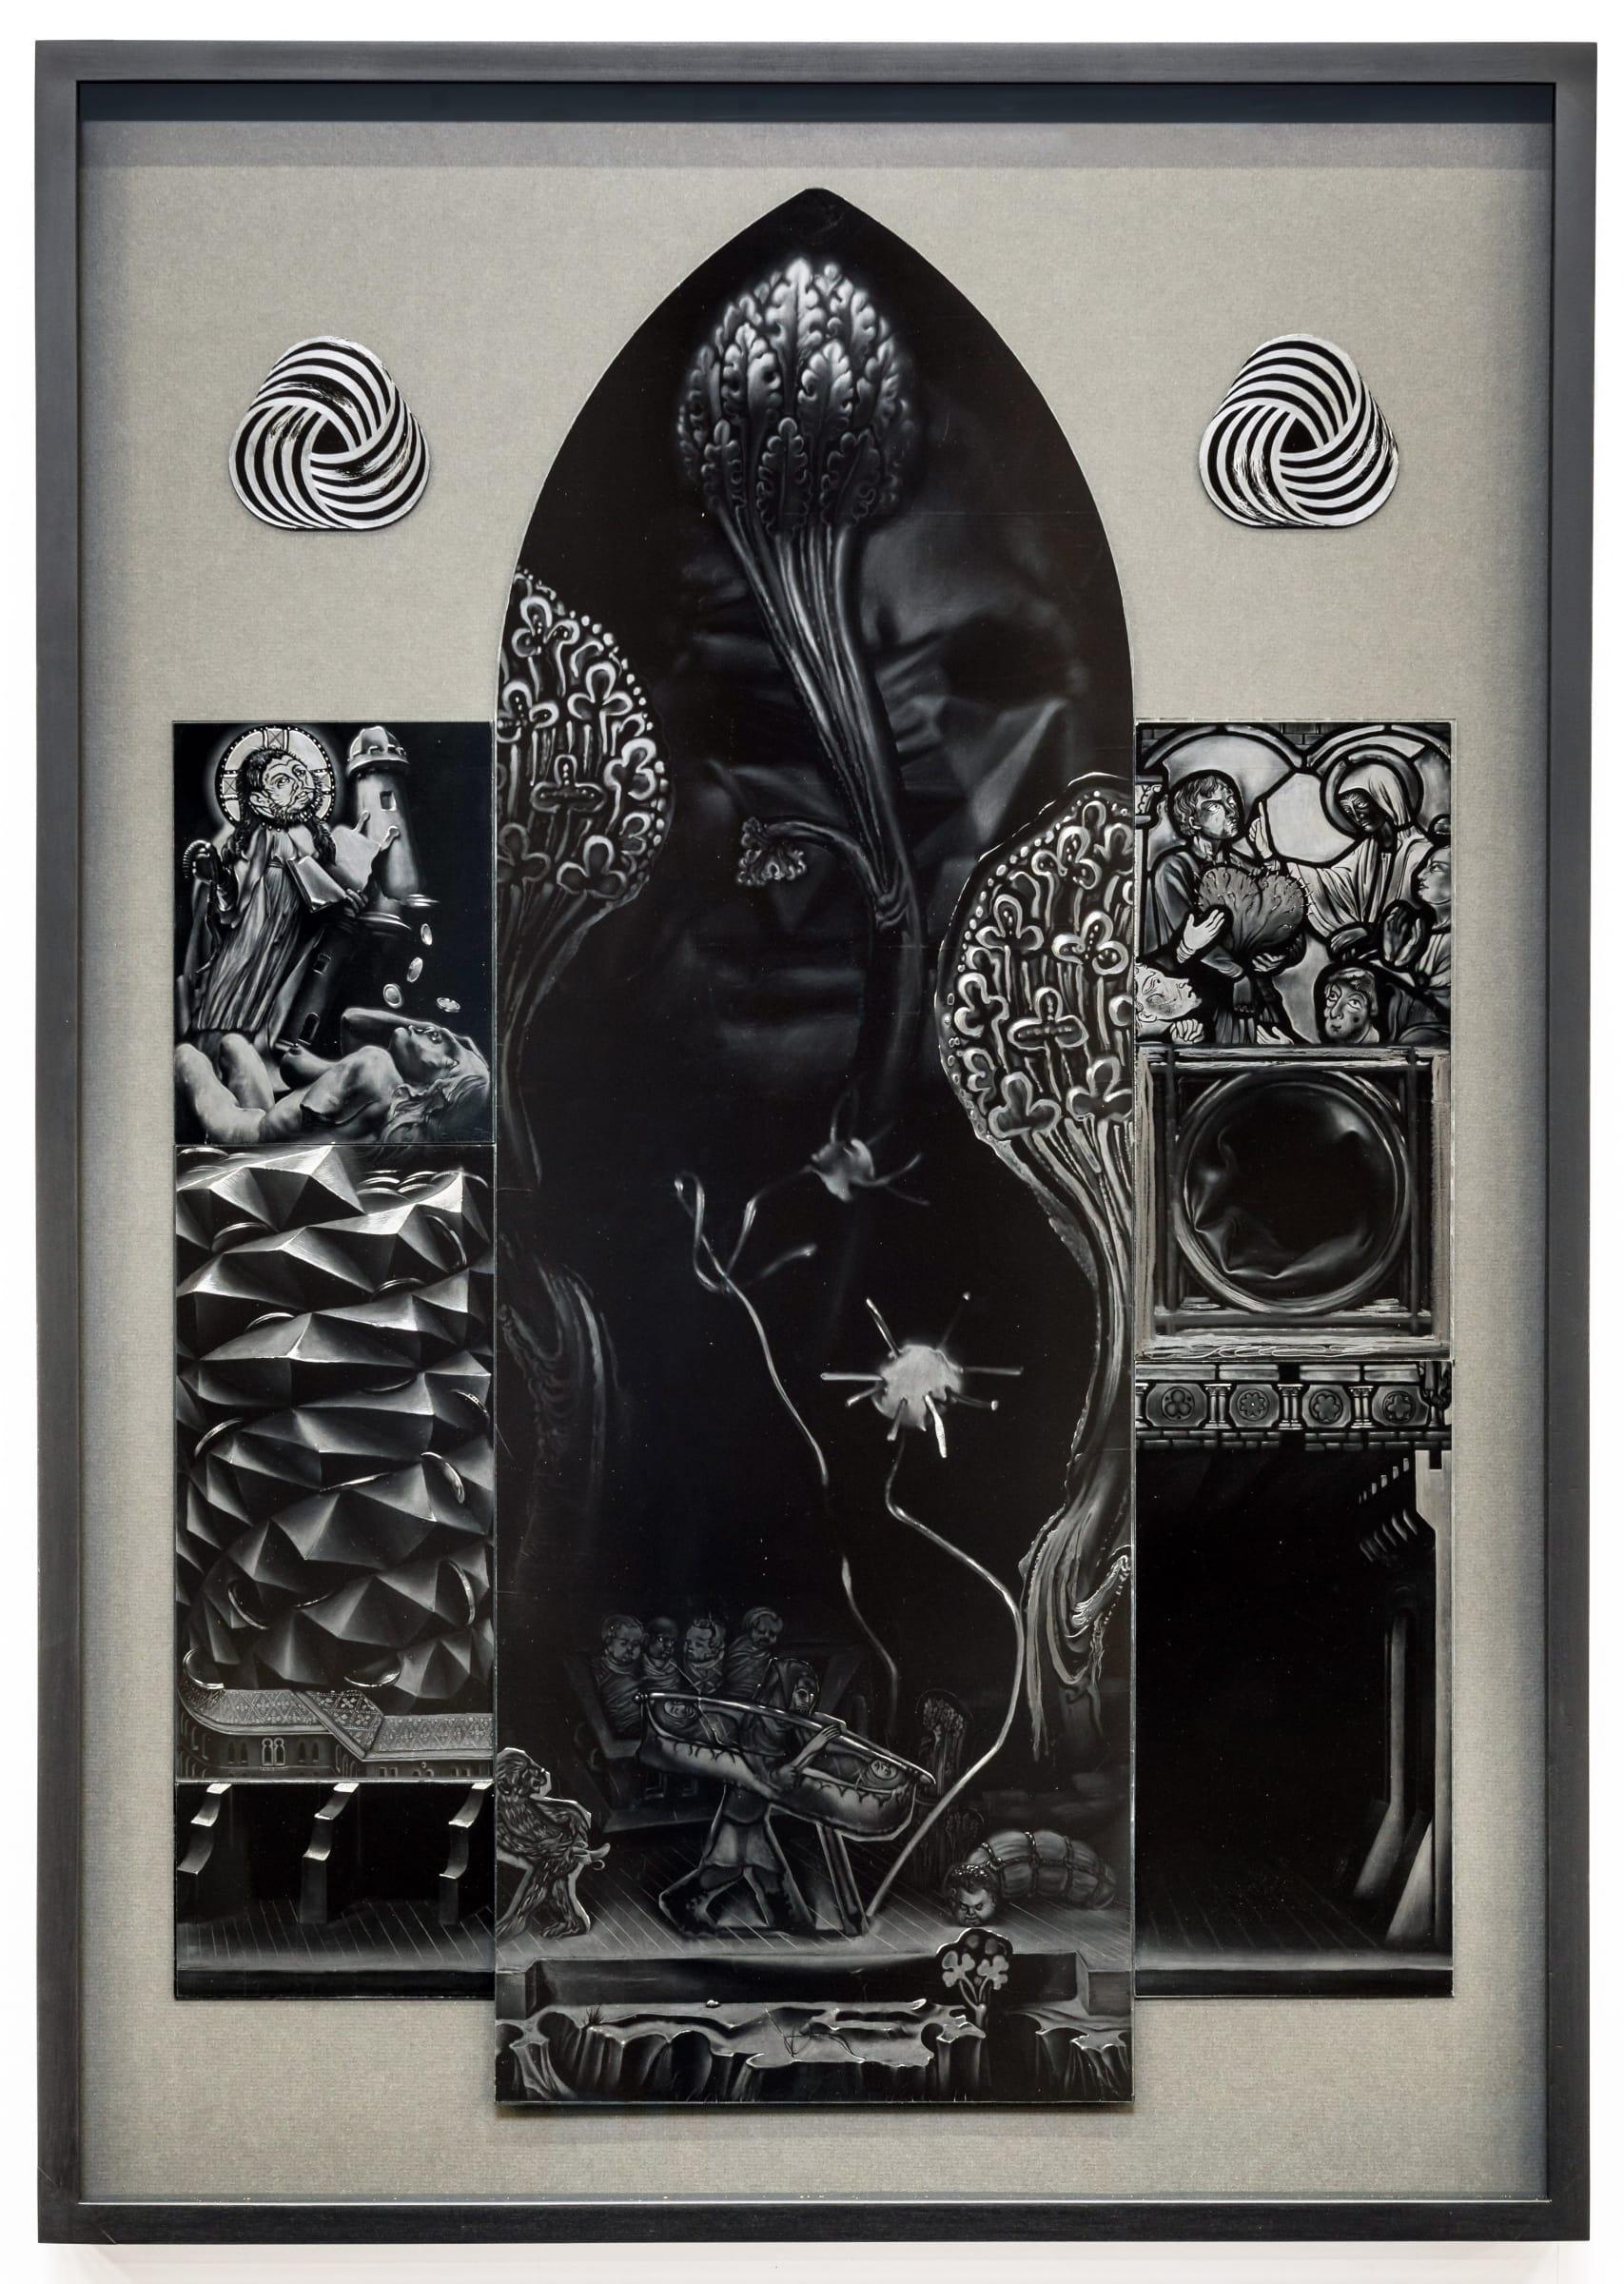 <span class=&#34;link fancybox-details-link&#34;><a href=&#34;/exhibitions/98/works/image2015/&#34;>View Detail Page</a></span><div id=&#34;artwork-panel-details&#34; class=&#34;standard-artwork-details&#34;><div class=&#34;artist&#34;><strong>Robert McNally</strong></div><div class=&#34;title&#34;><em>Bonafide Malafide</em>, 2016</div><div class=&#34;medium&#34;>Graphite on ultra-black carbon nanotube coated aluminium</div><div class=&#34;dimensions&#34;>102 x 72 cm<br /> 40 1/8 x 28 3/8 in<br /> (Framed)</div><div class=&#34;dimensions&#34;><em>Courtesy of David Risley gallery Copenhagen</em></div></div>